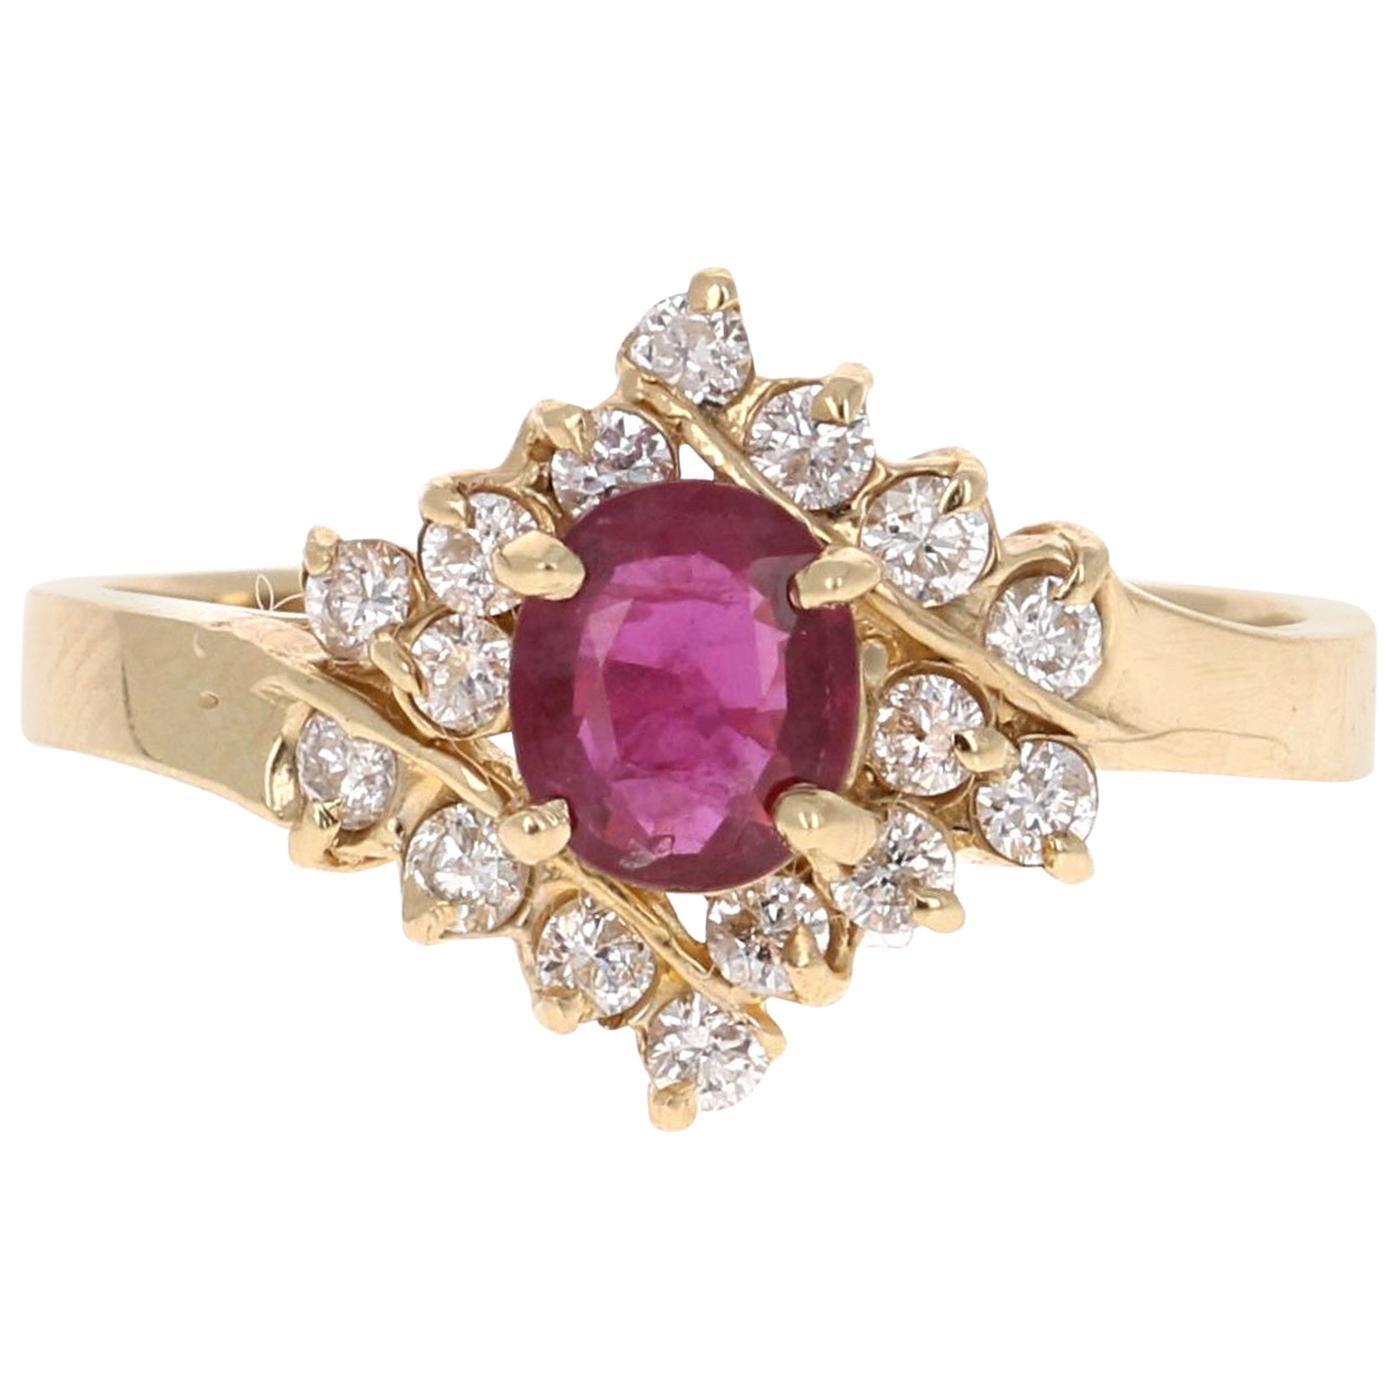 1.06 Carat Oval Cut Burmese Ruby Diamond 14 Karat Yellow Gold Ring